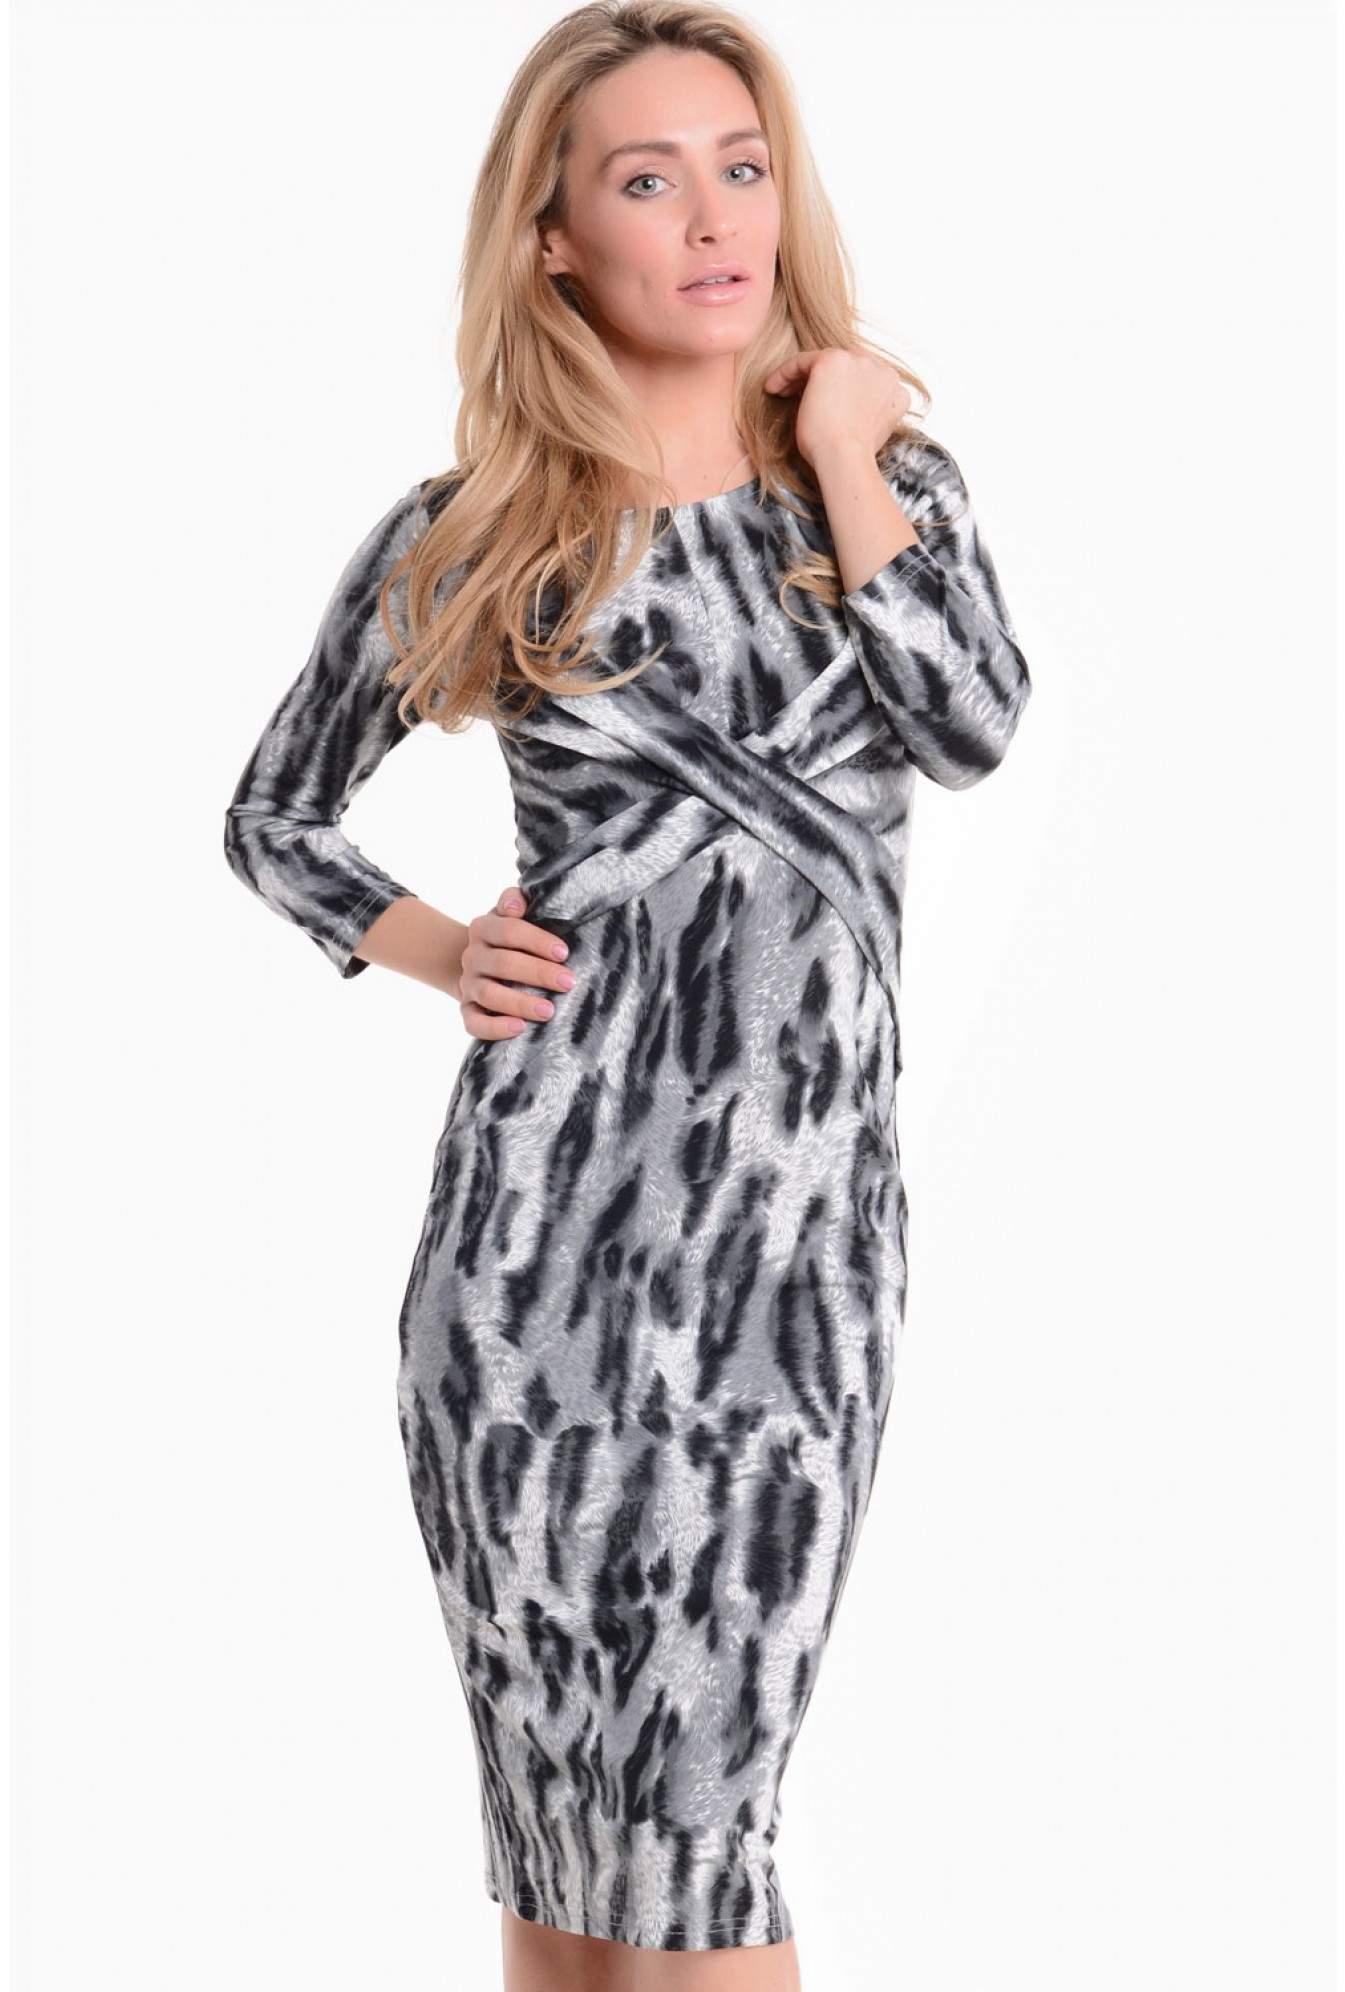 acf1667fb840d Stella Joyce Animal Print Bodycon Dress | iCLOTHING